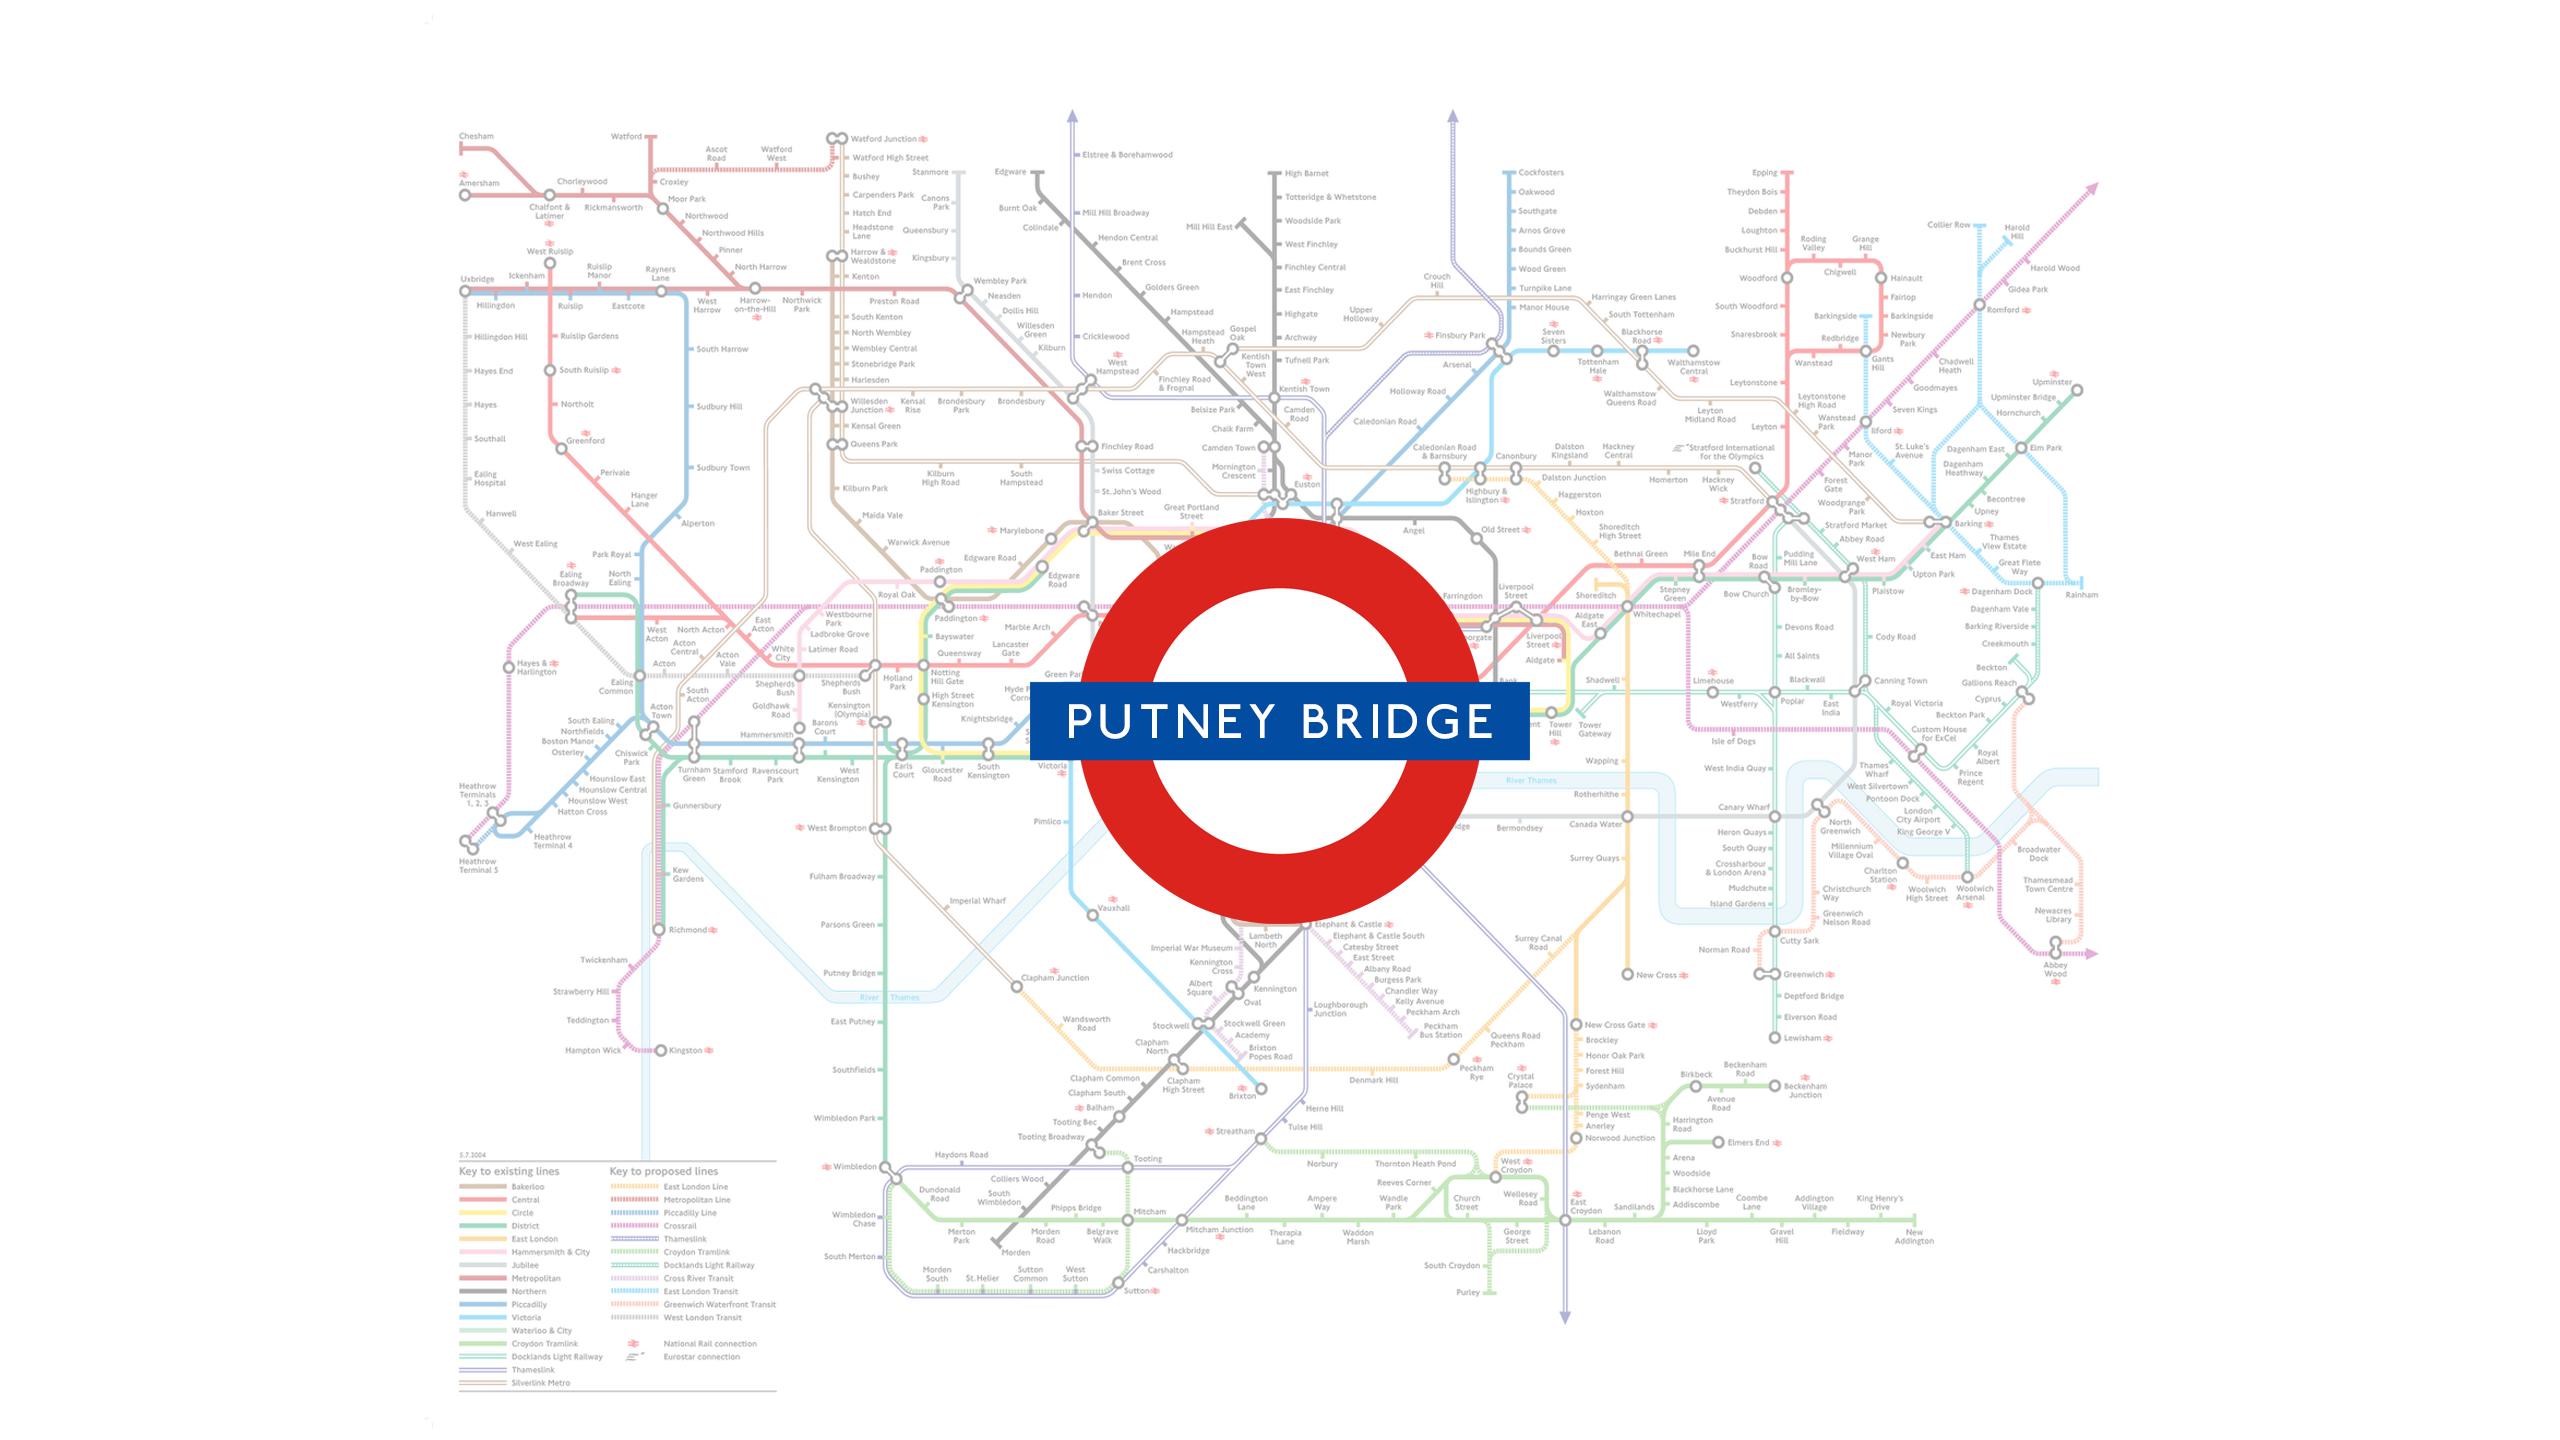 Putney Bridge (Map)